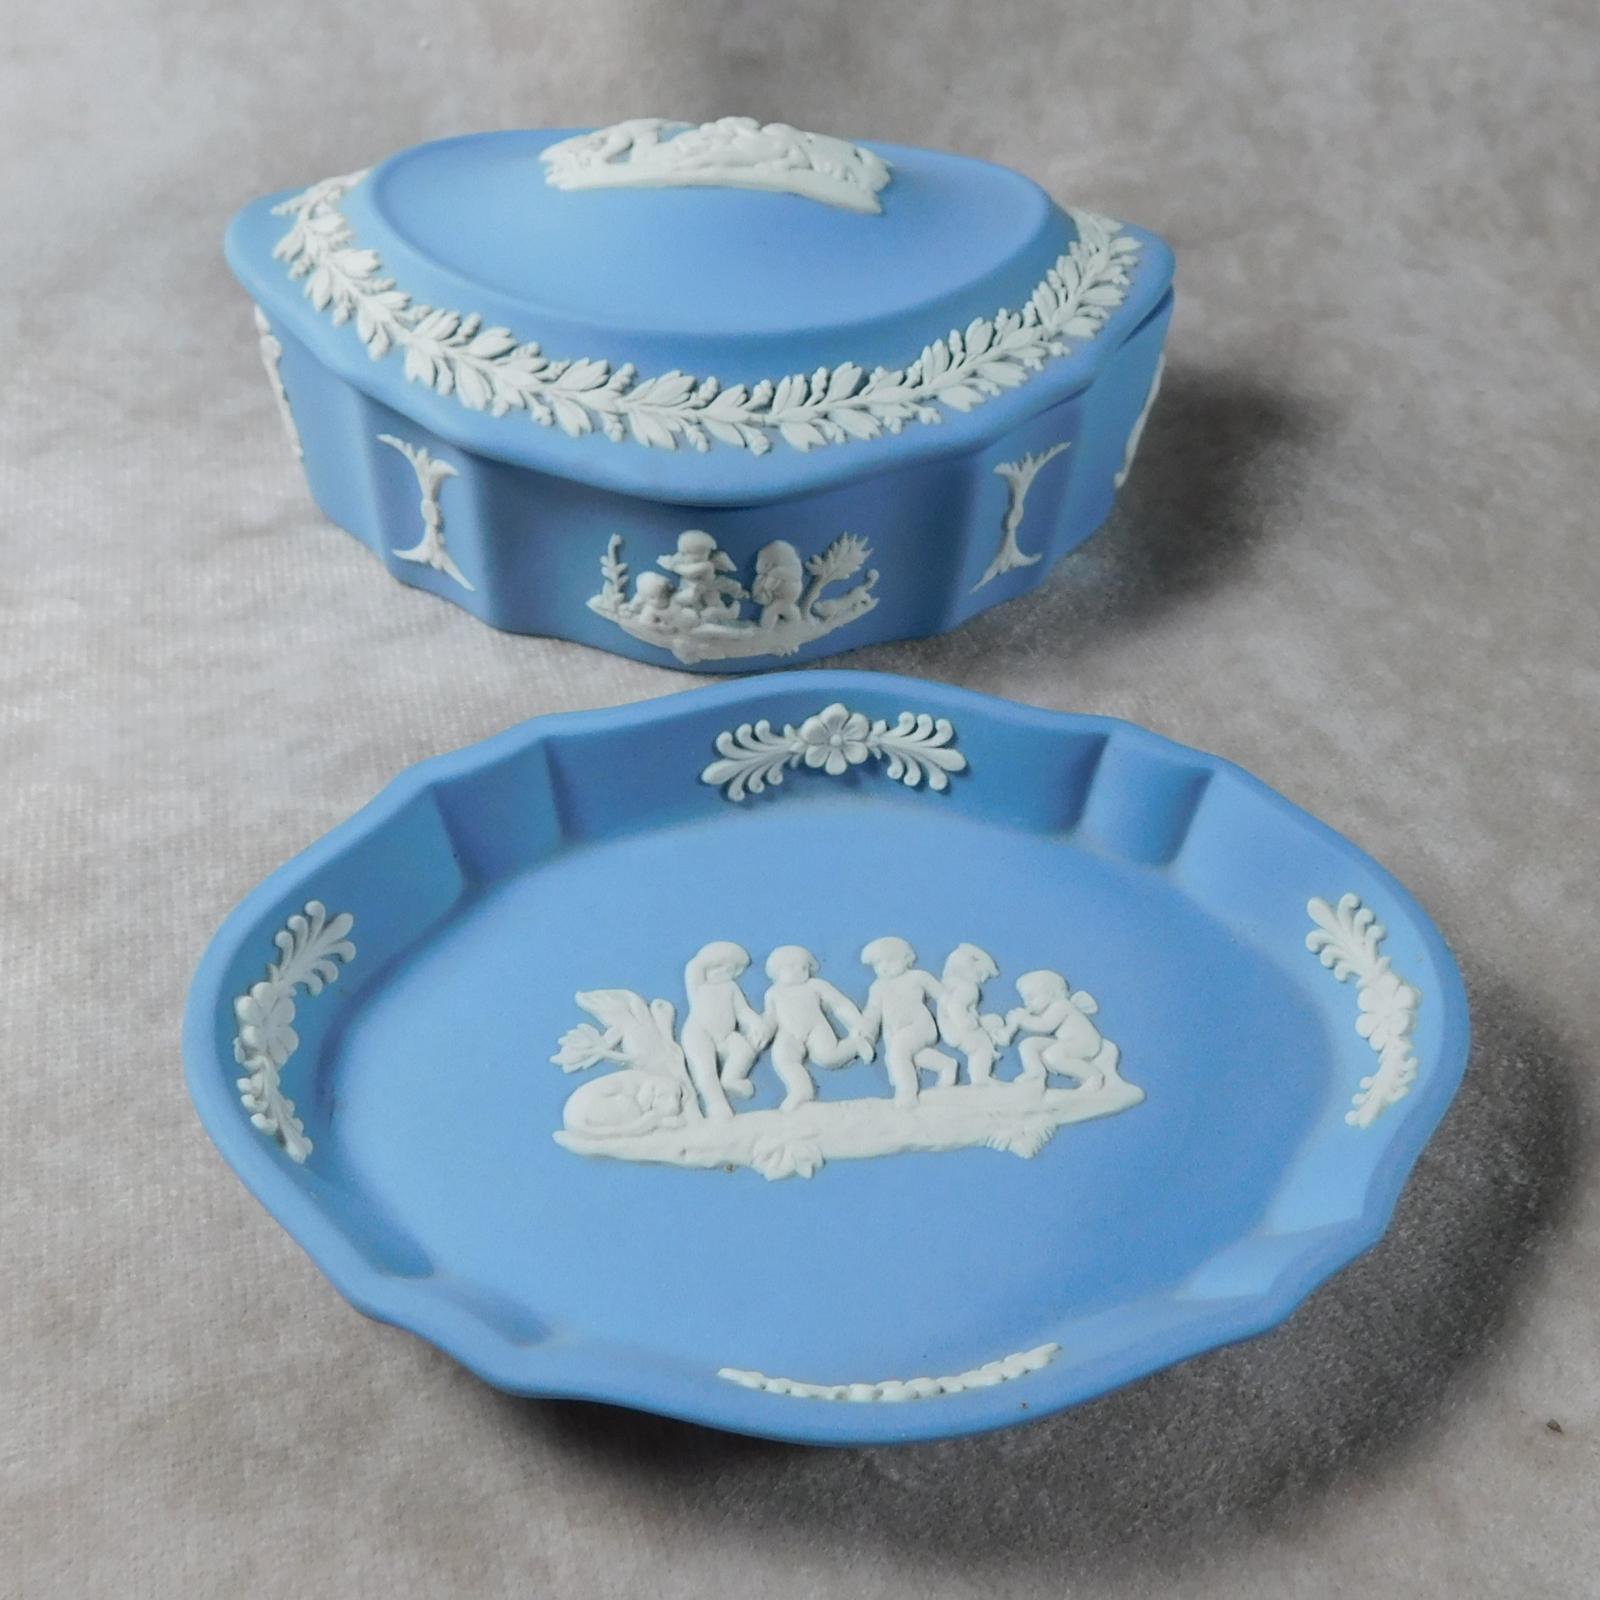 Wedgwood Blue Jasperware Trinket Box & Tray (1 of 1)